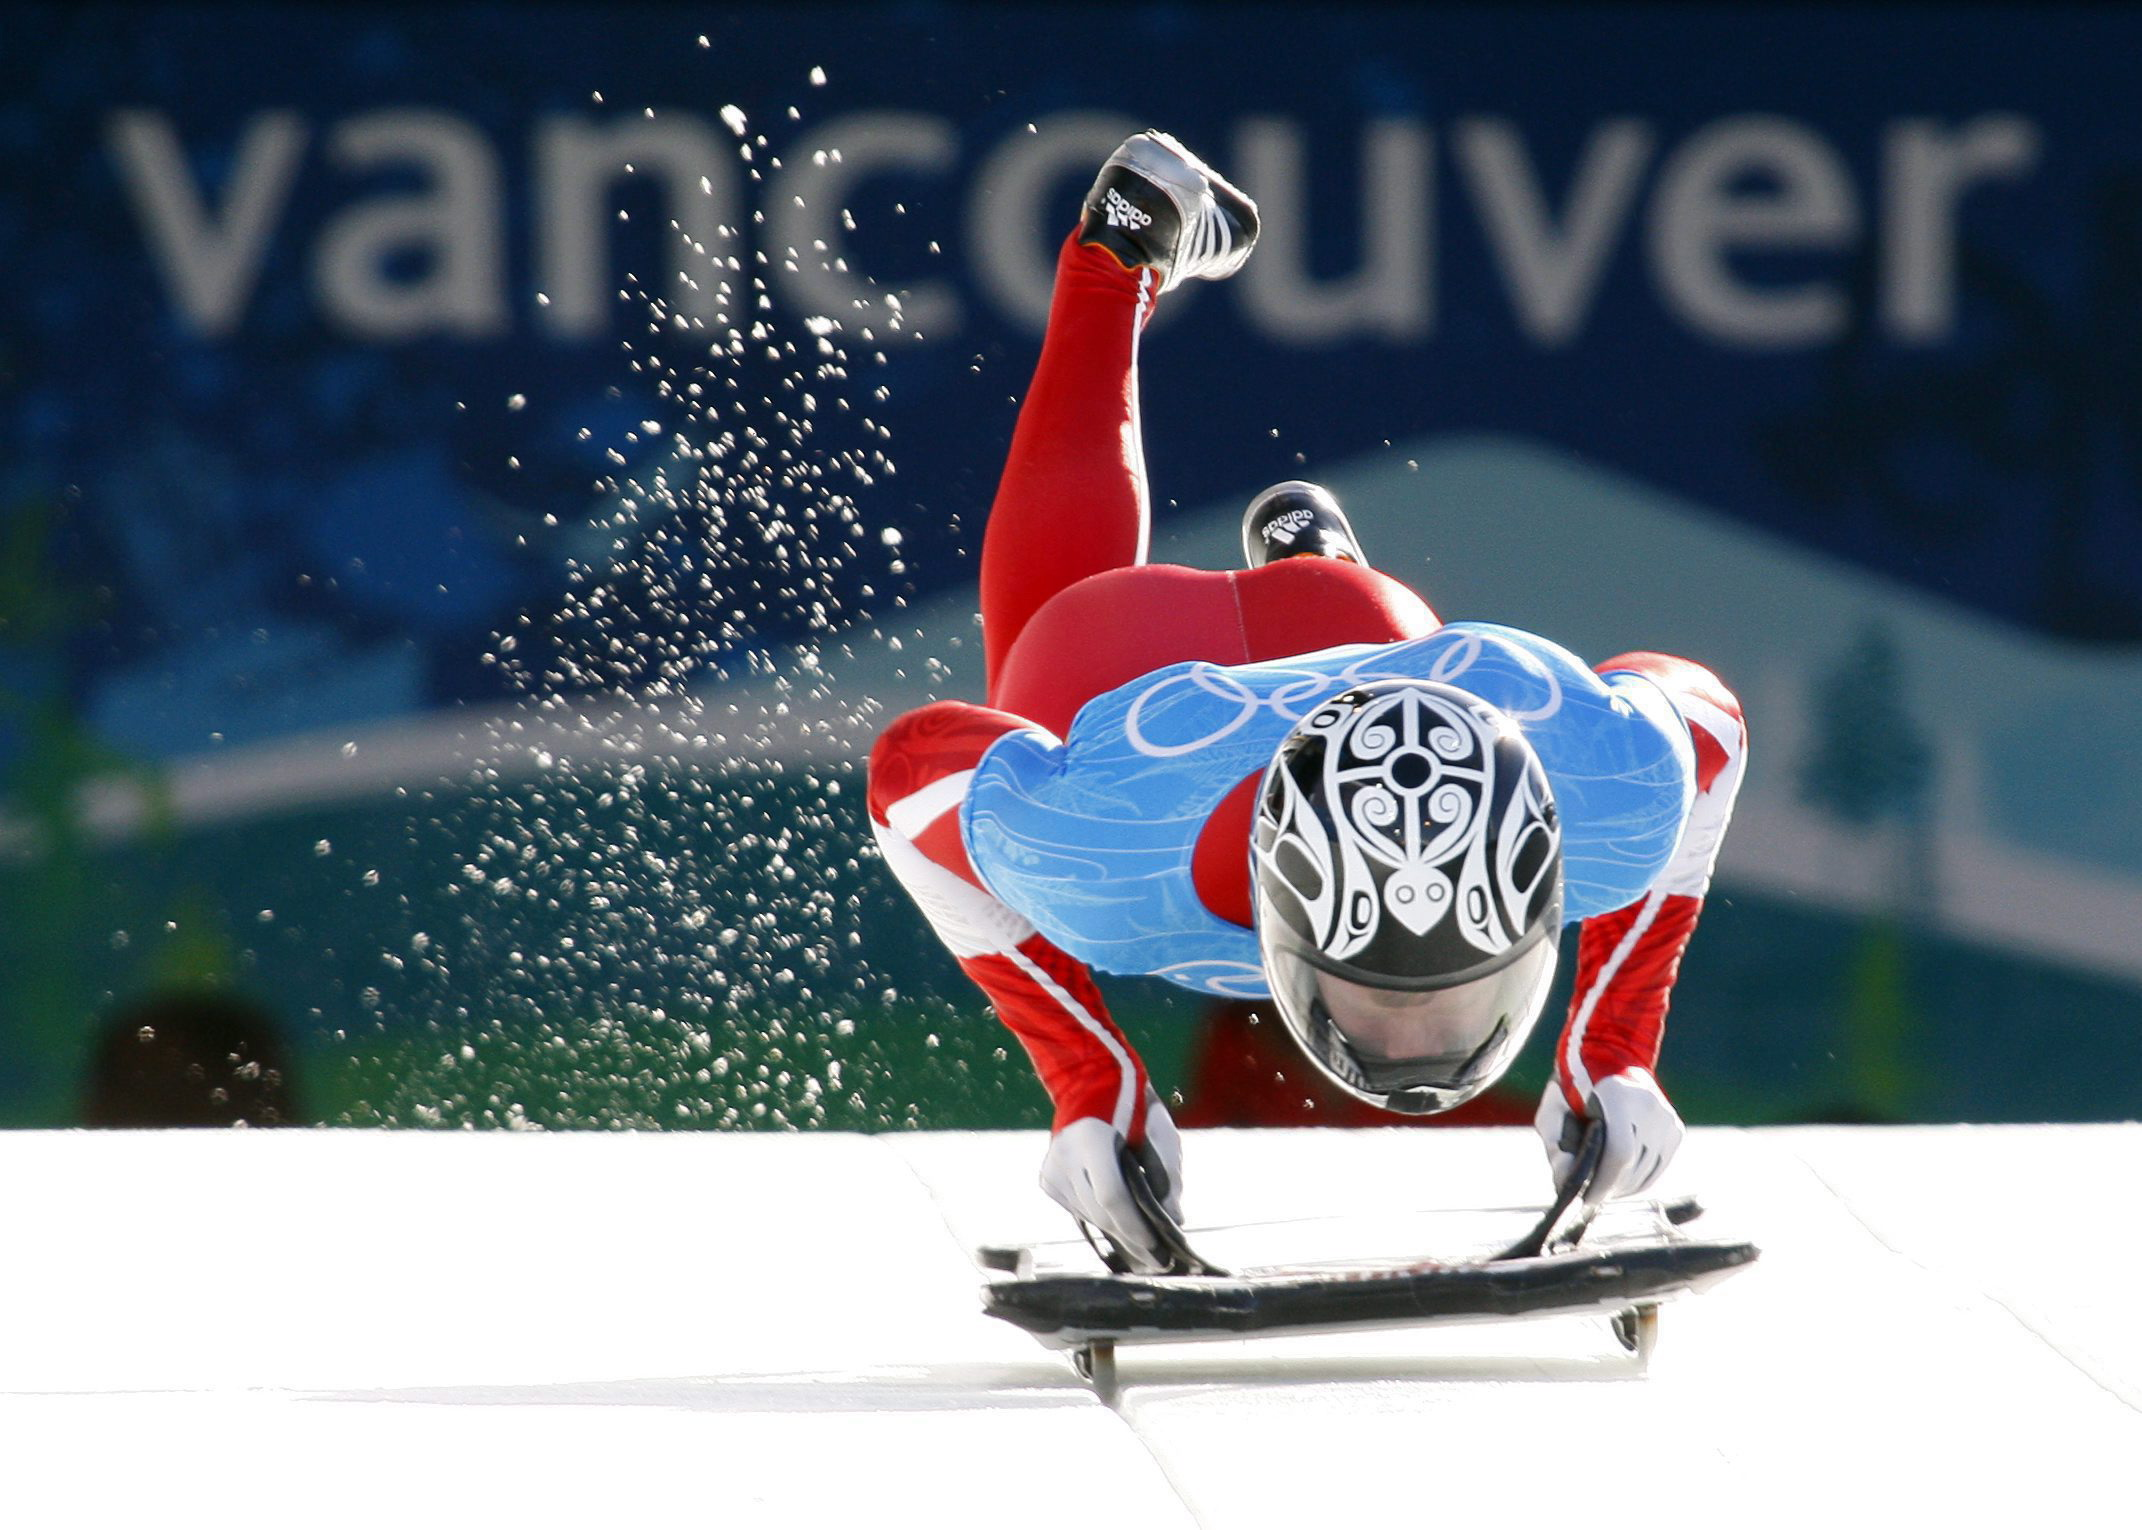 Jon Montgomery on his sled